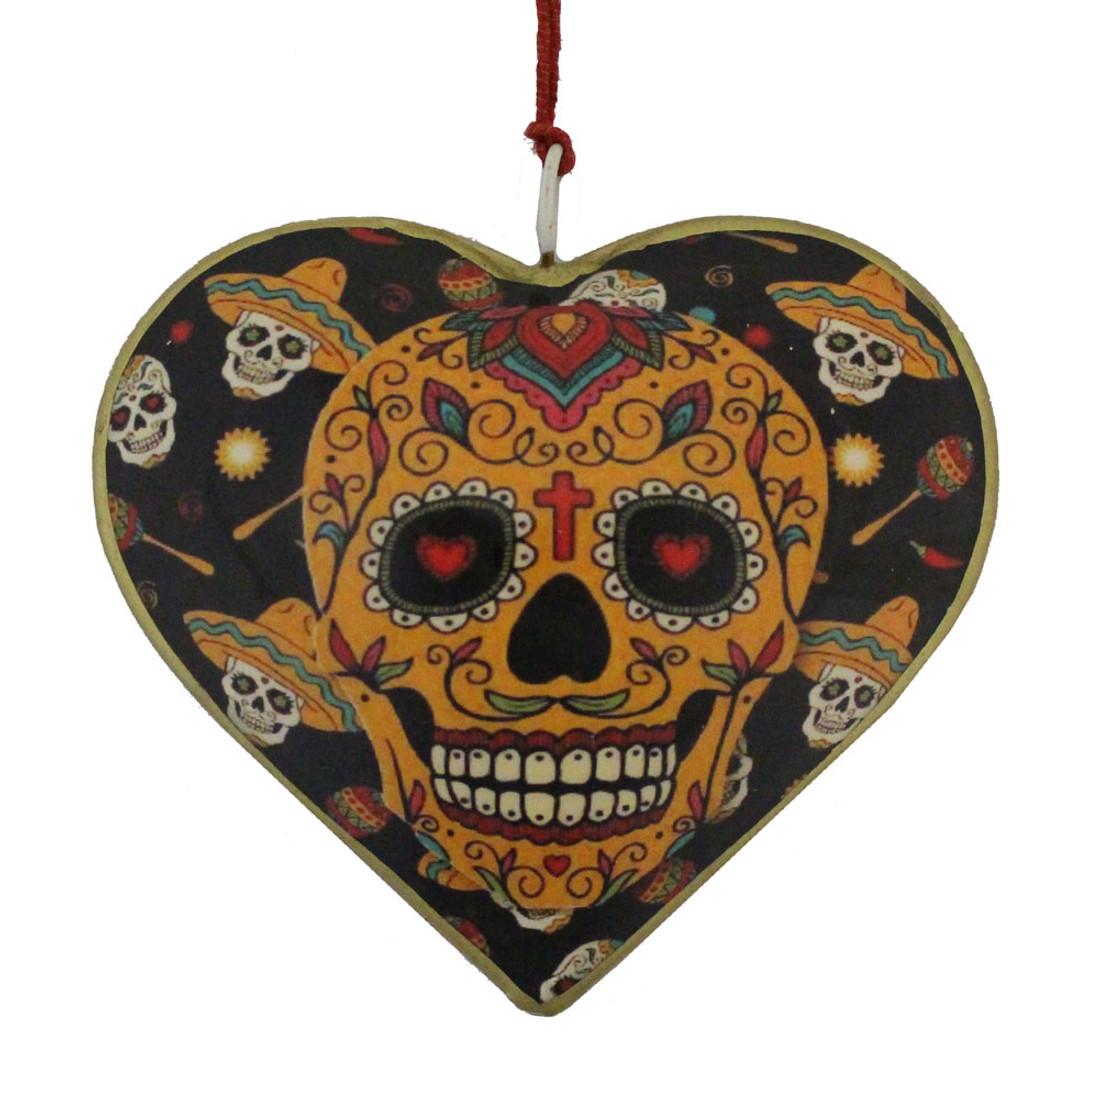 Fiesta Sugar Skull Day of the Dead Heart Christmas Holiday Ornament